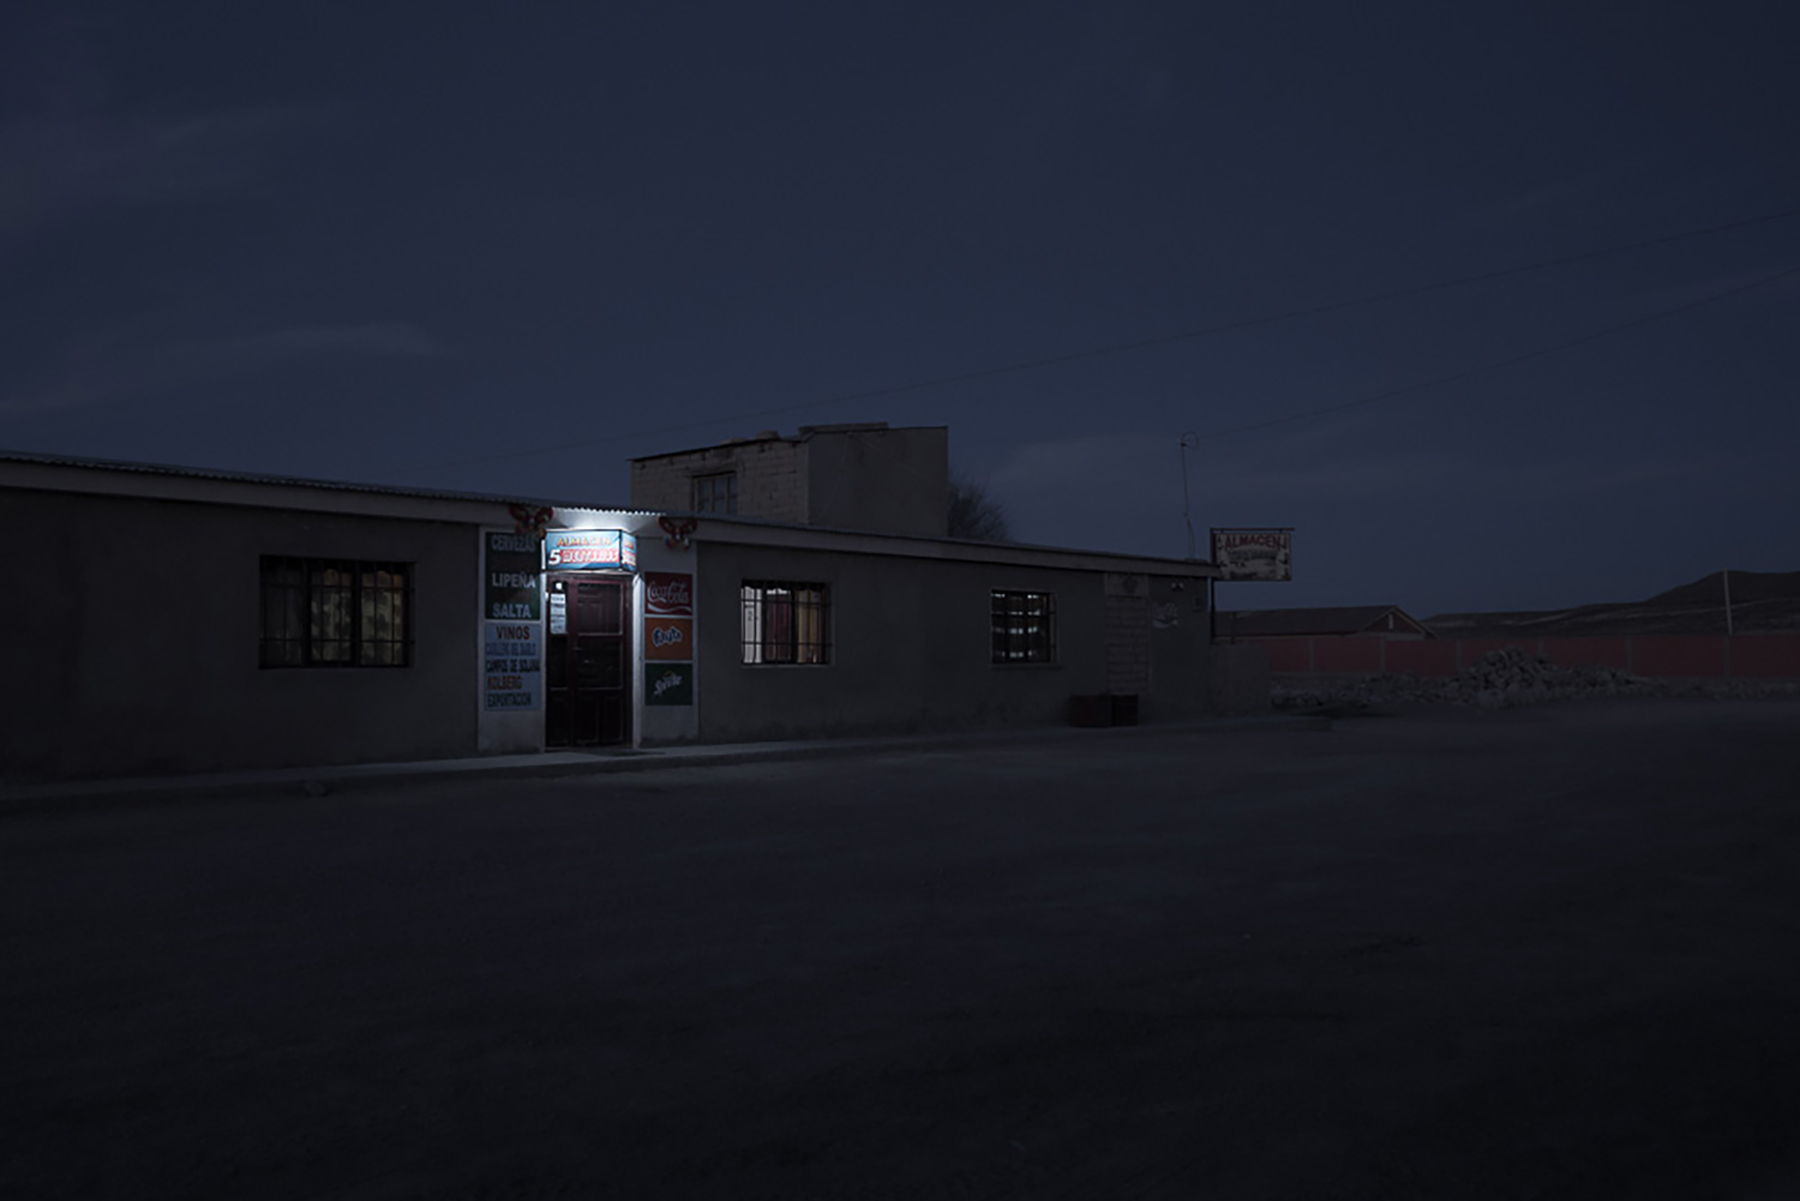 iGNANT-Julien-Mauve-After-Lights-Out-05